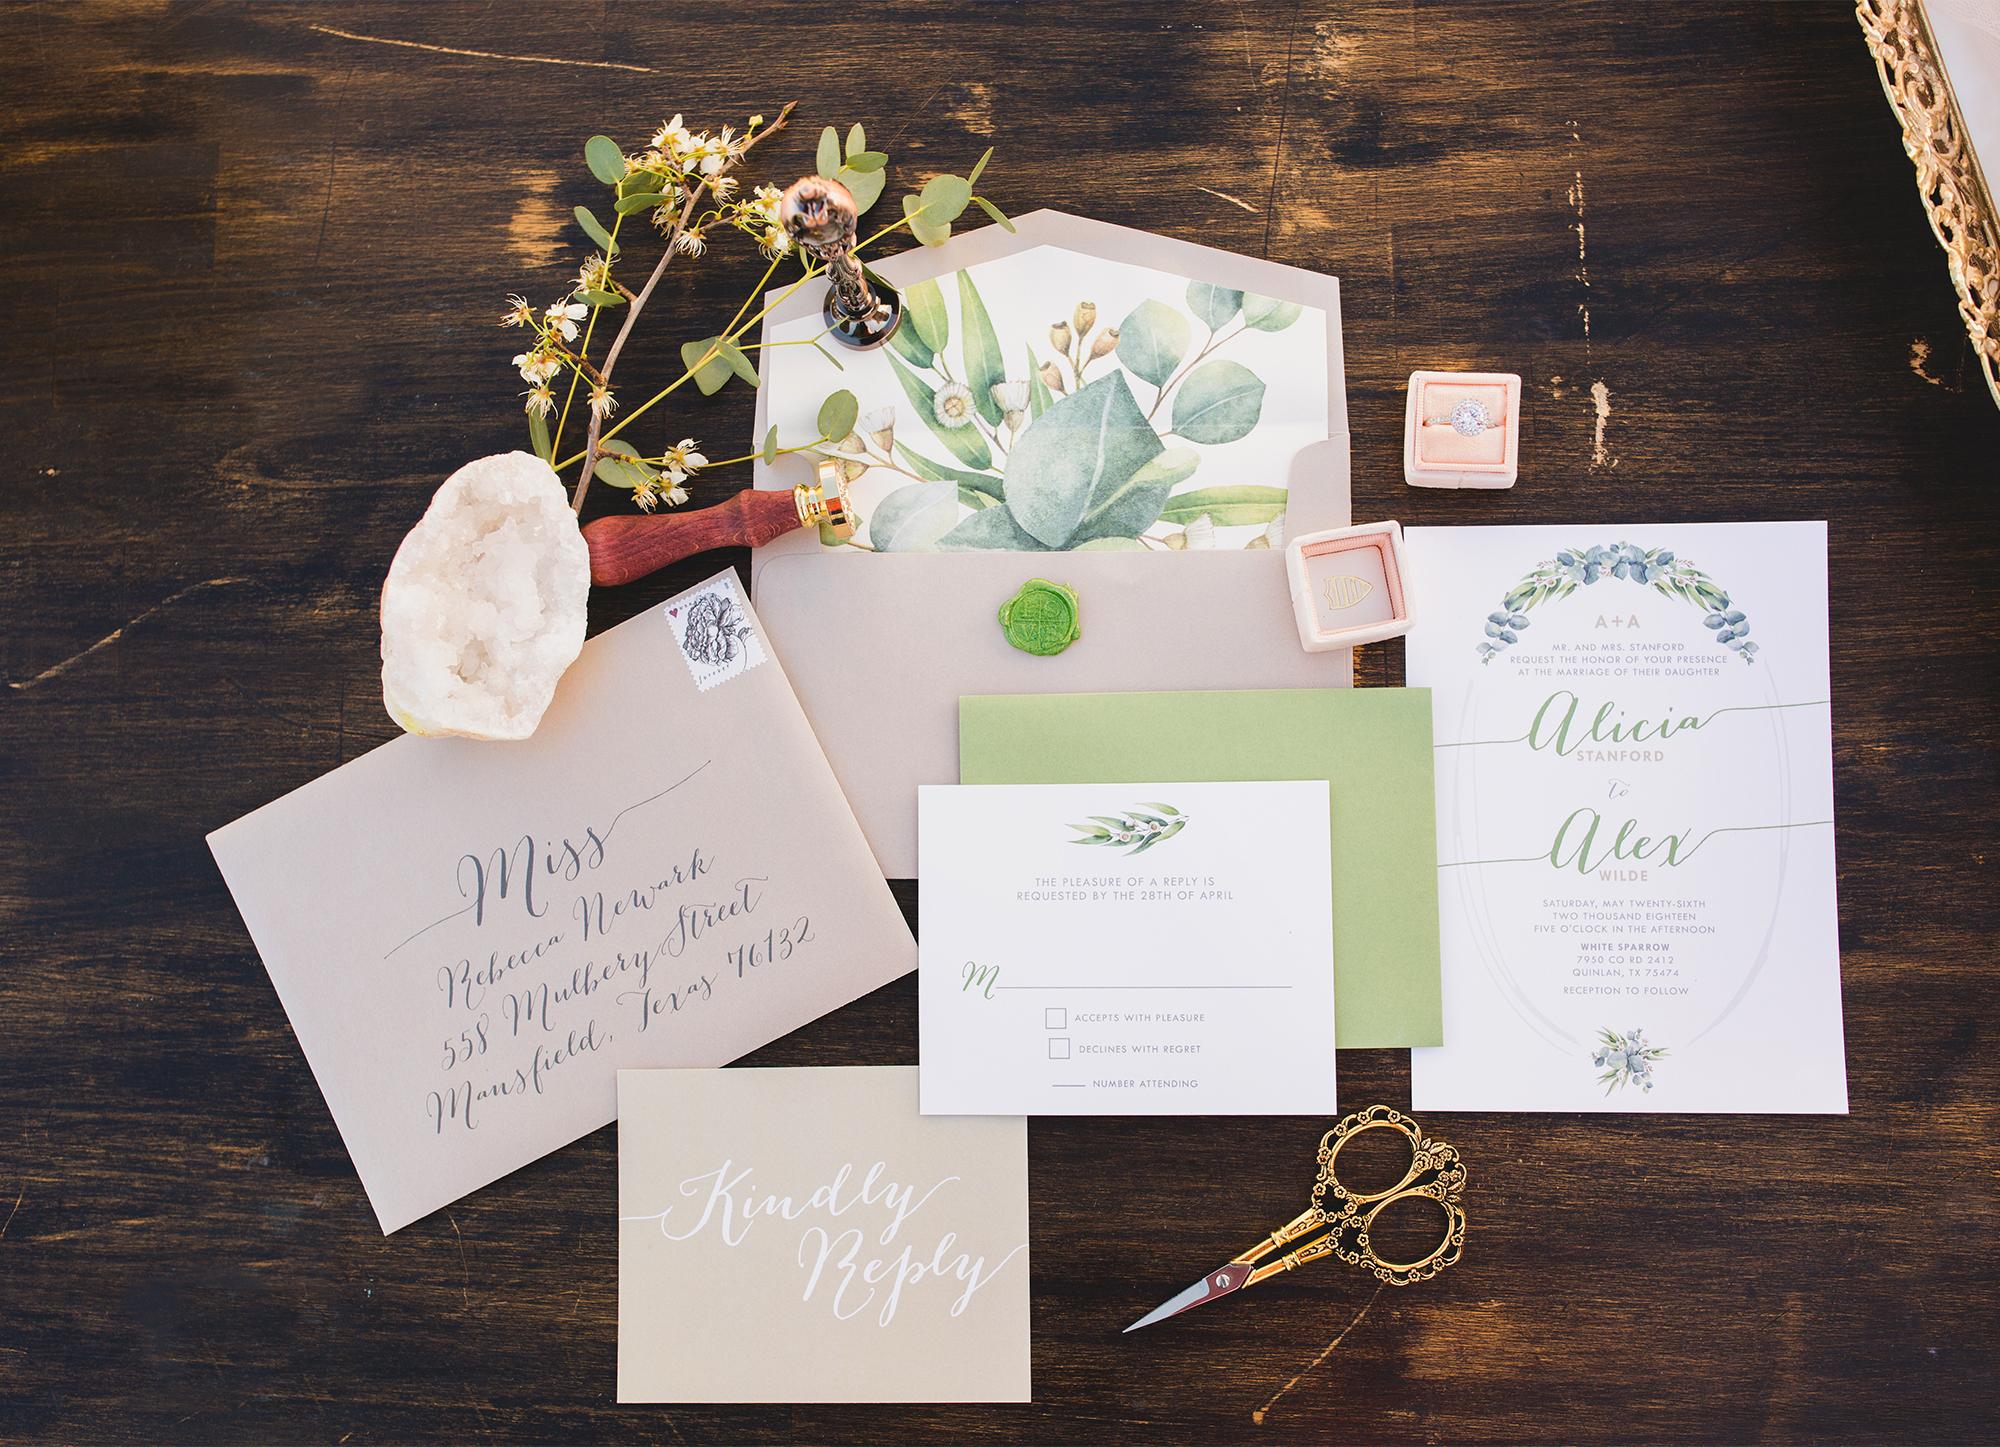 stationery-details-wedding-photography